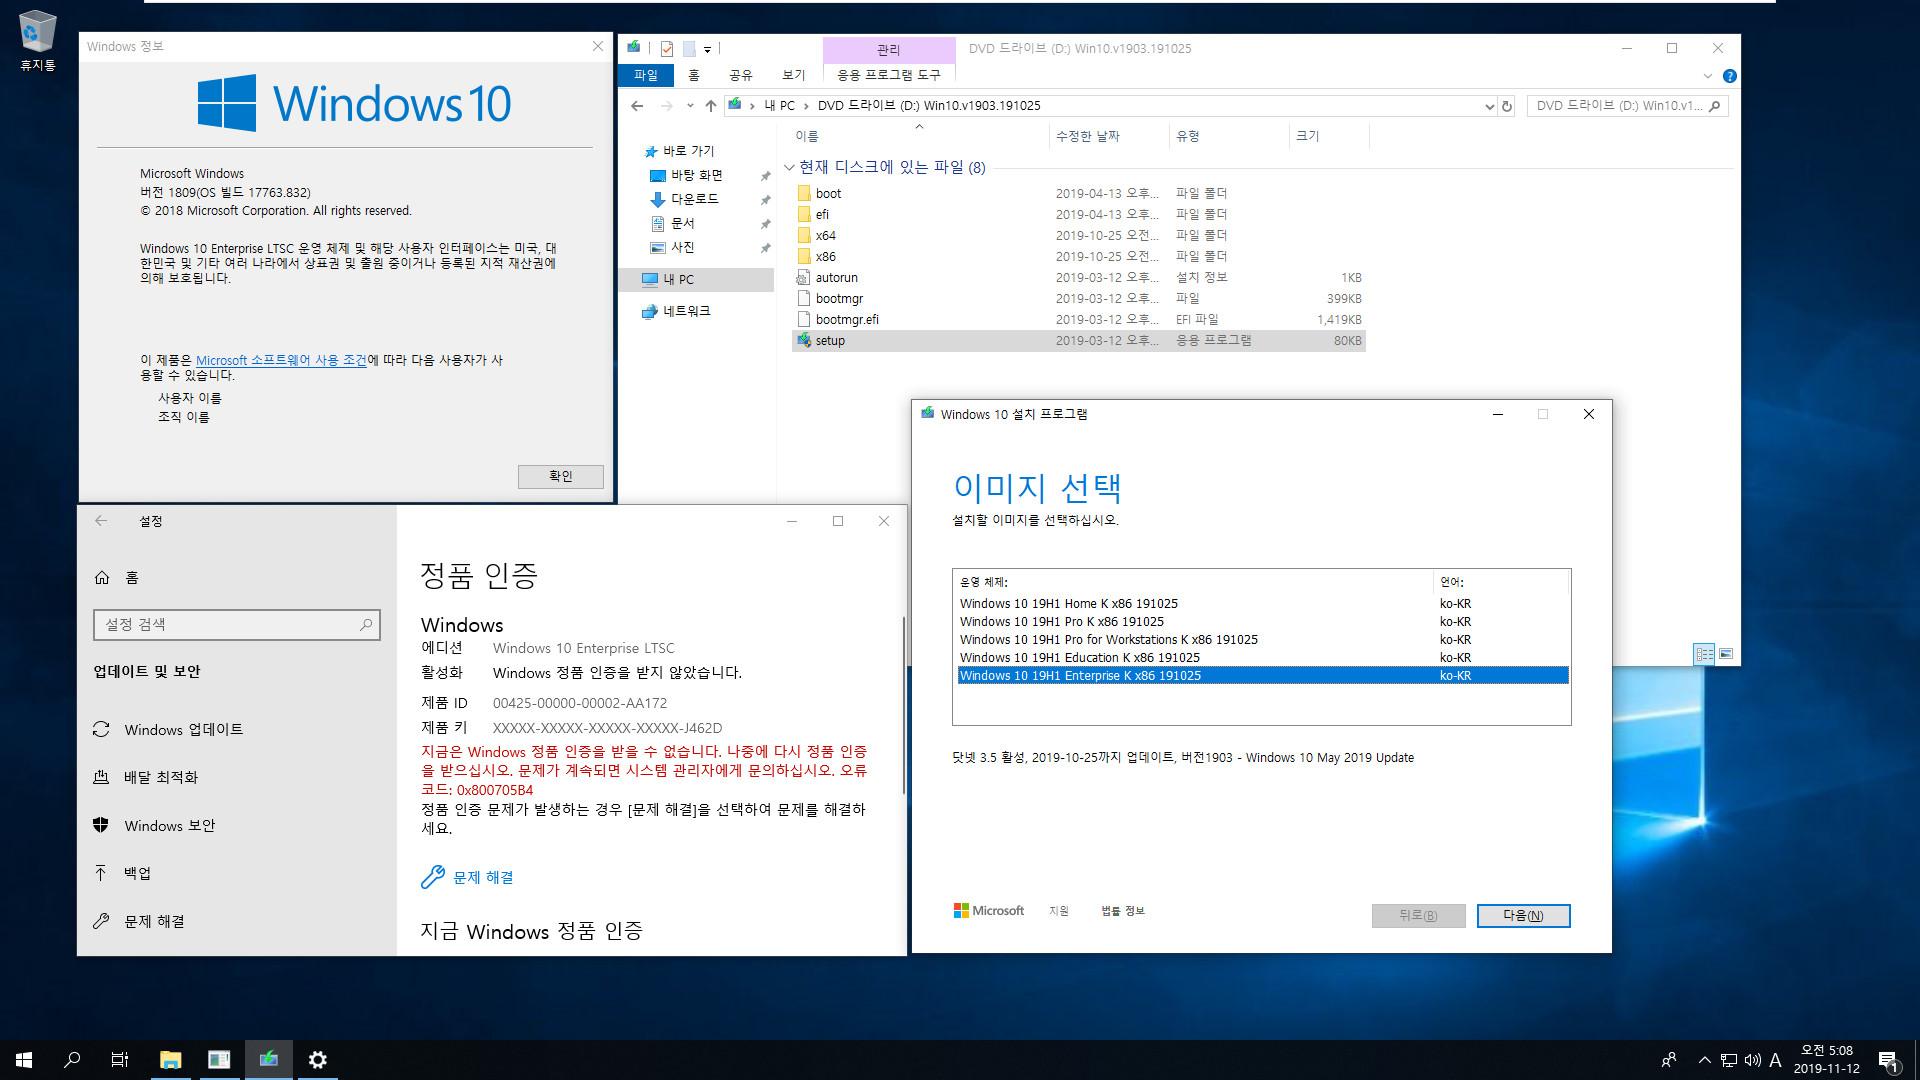 Windows 10 Enterprise LTSC [2019] (버전 1809) 를 버전 1903 프로로 업그레이드 설치하기 - 우선 설정과 앱 유지를 위해서 버전 1903 Enterprise로 업그레이드 한 후에 버전 1903 Pro로 변경하면 됩니다 2019-11-12_050816.jpg